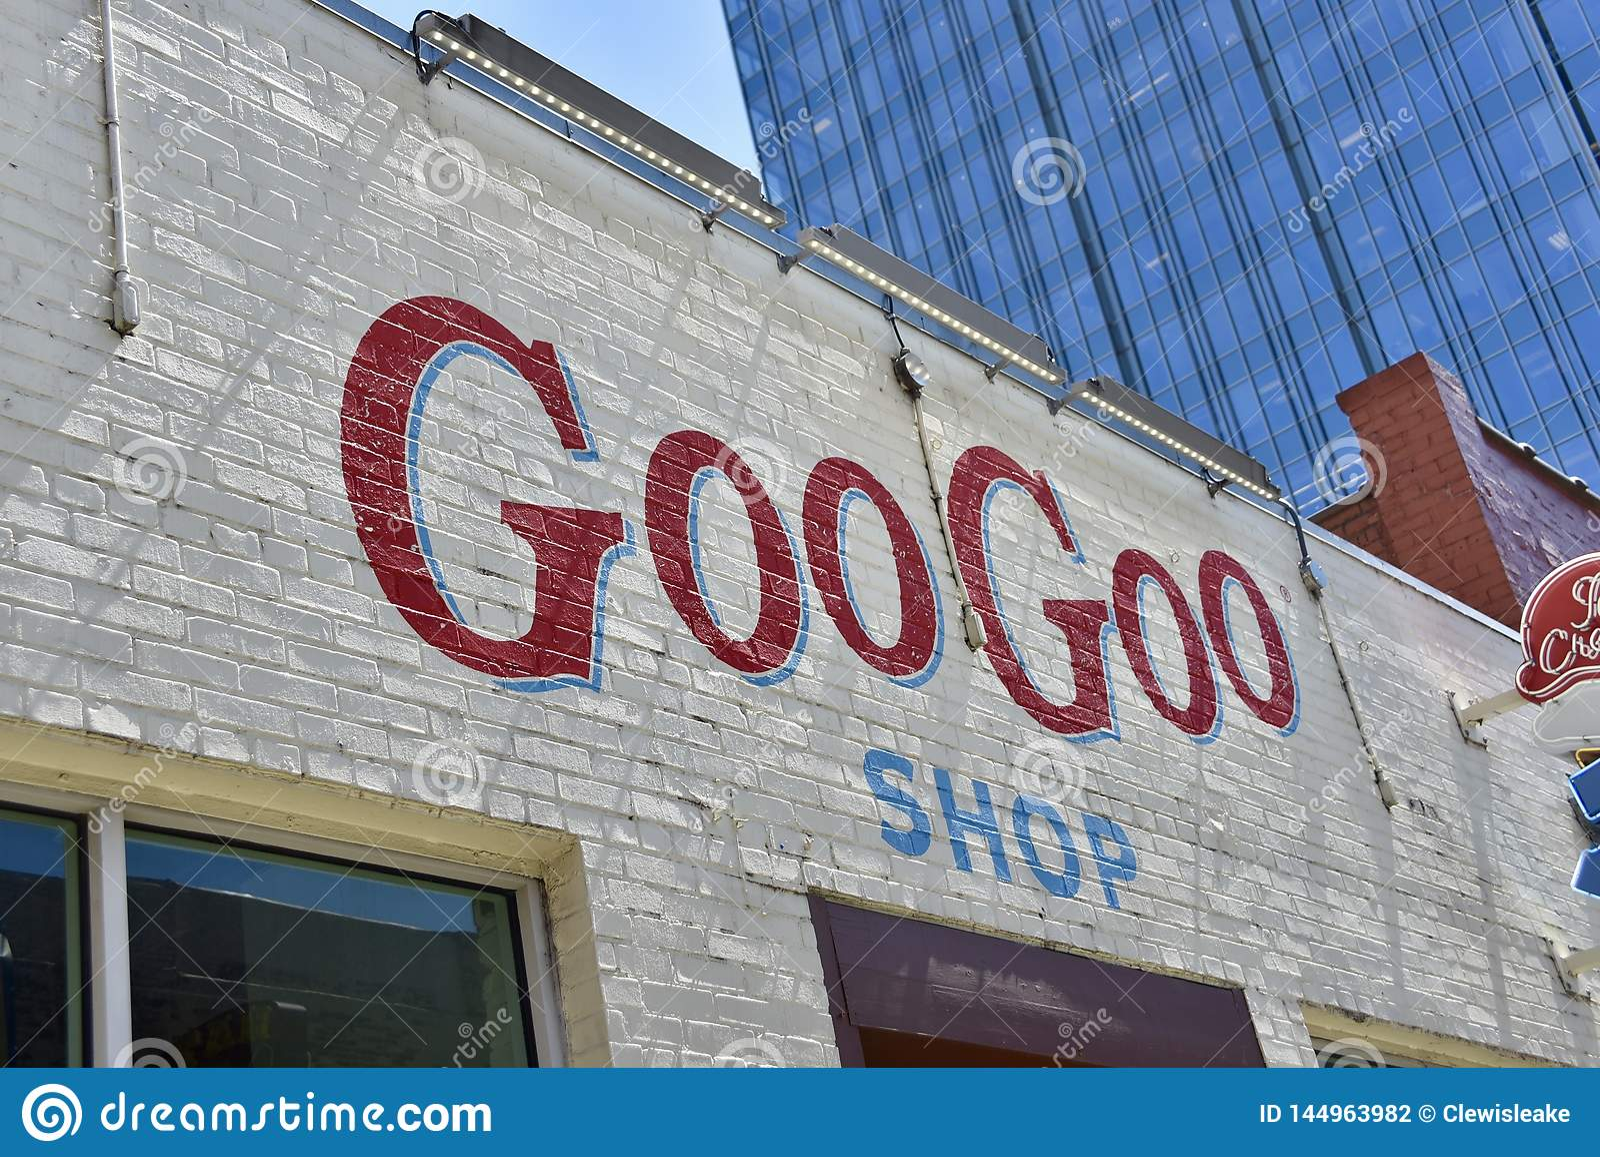 Goo Goo Clusters Shop, Nashville, Tennessee Editorial